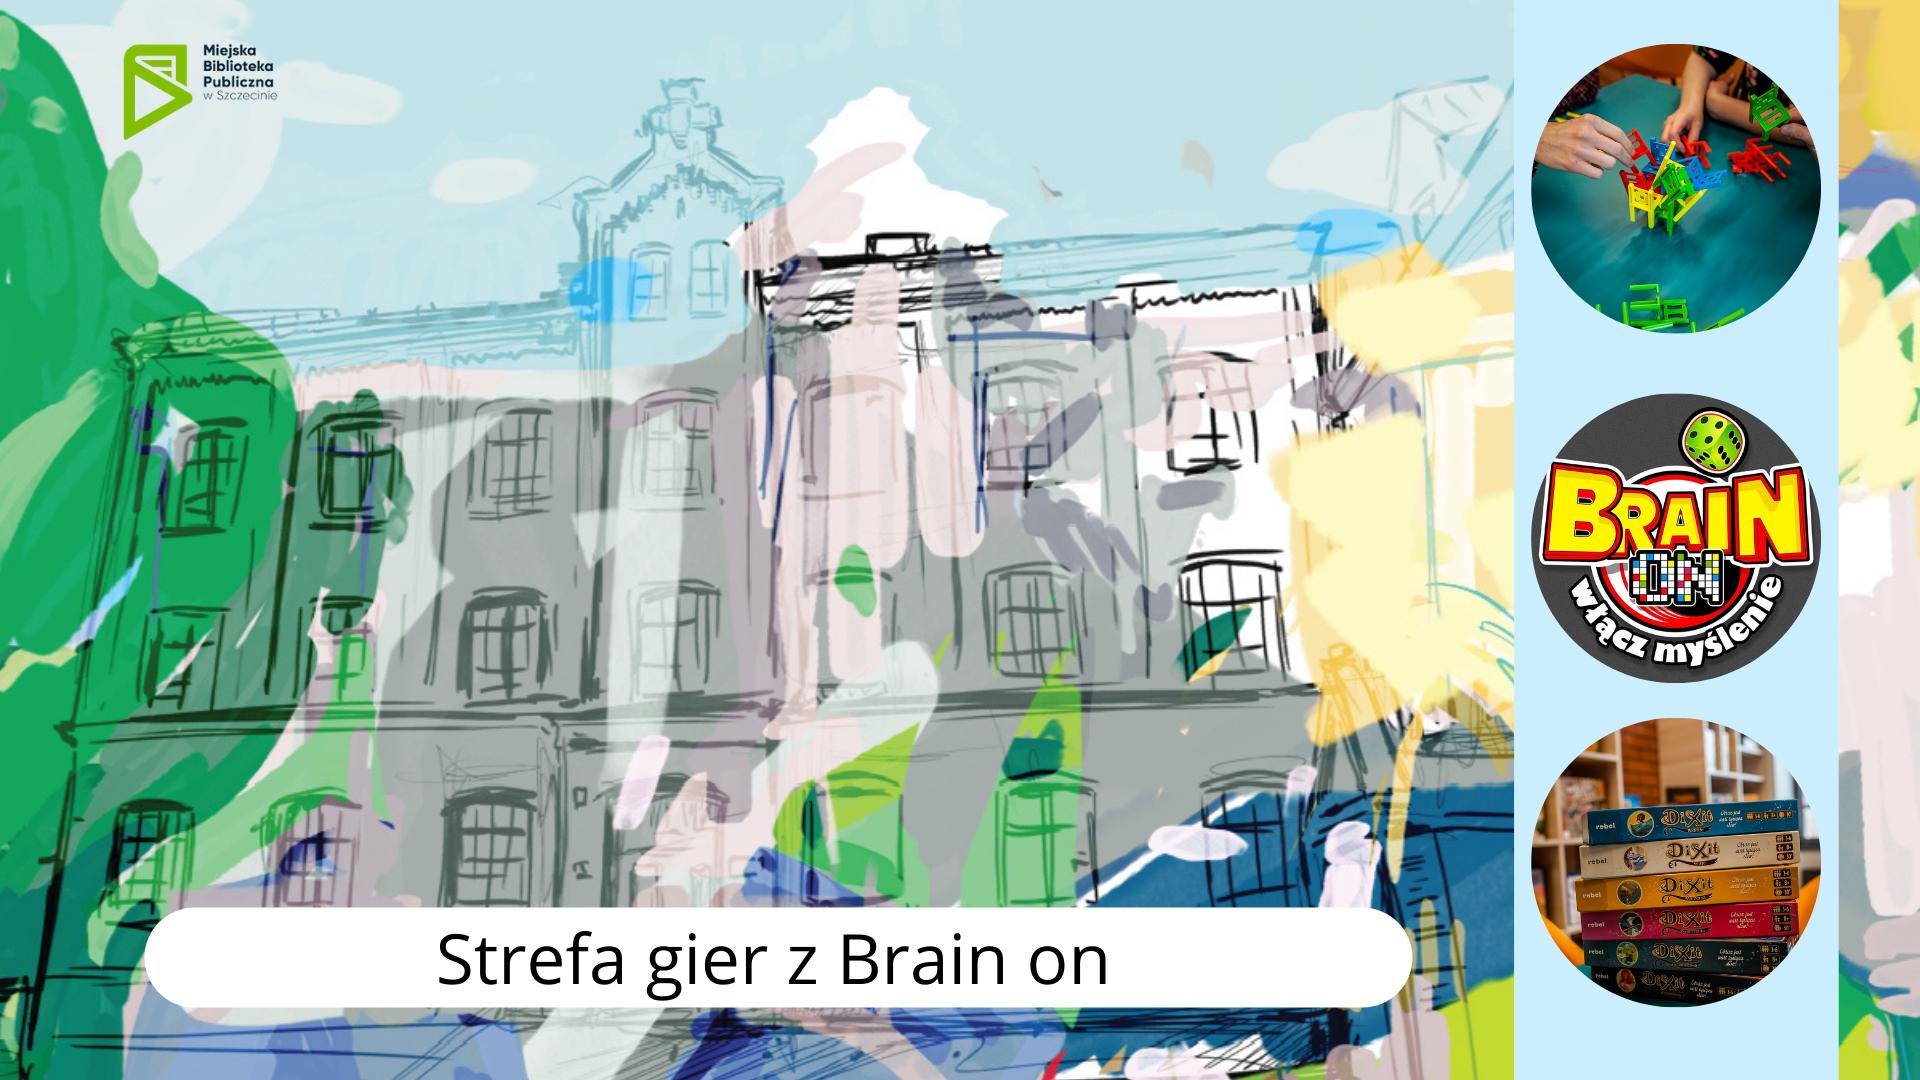 Strefa gier z Brain on